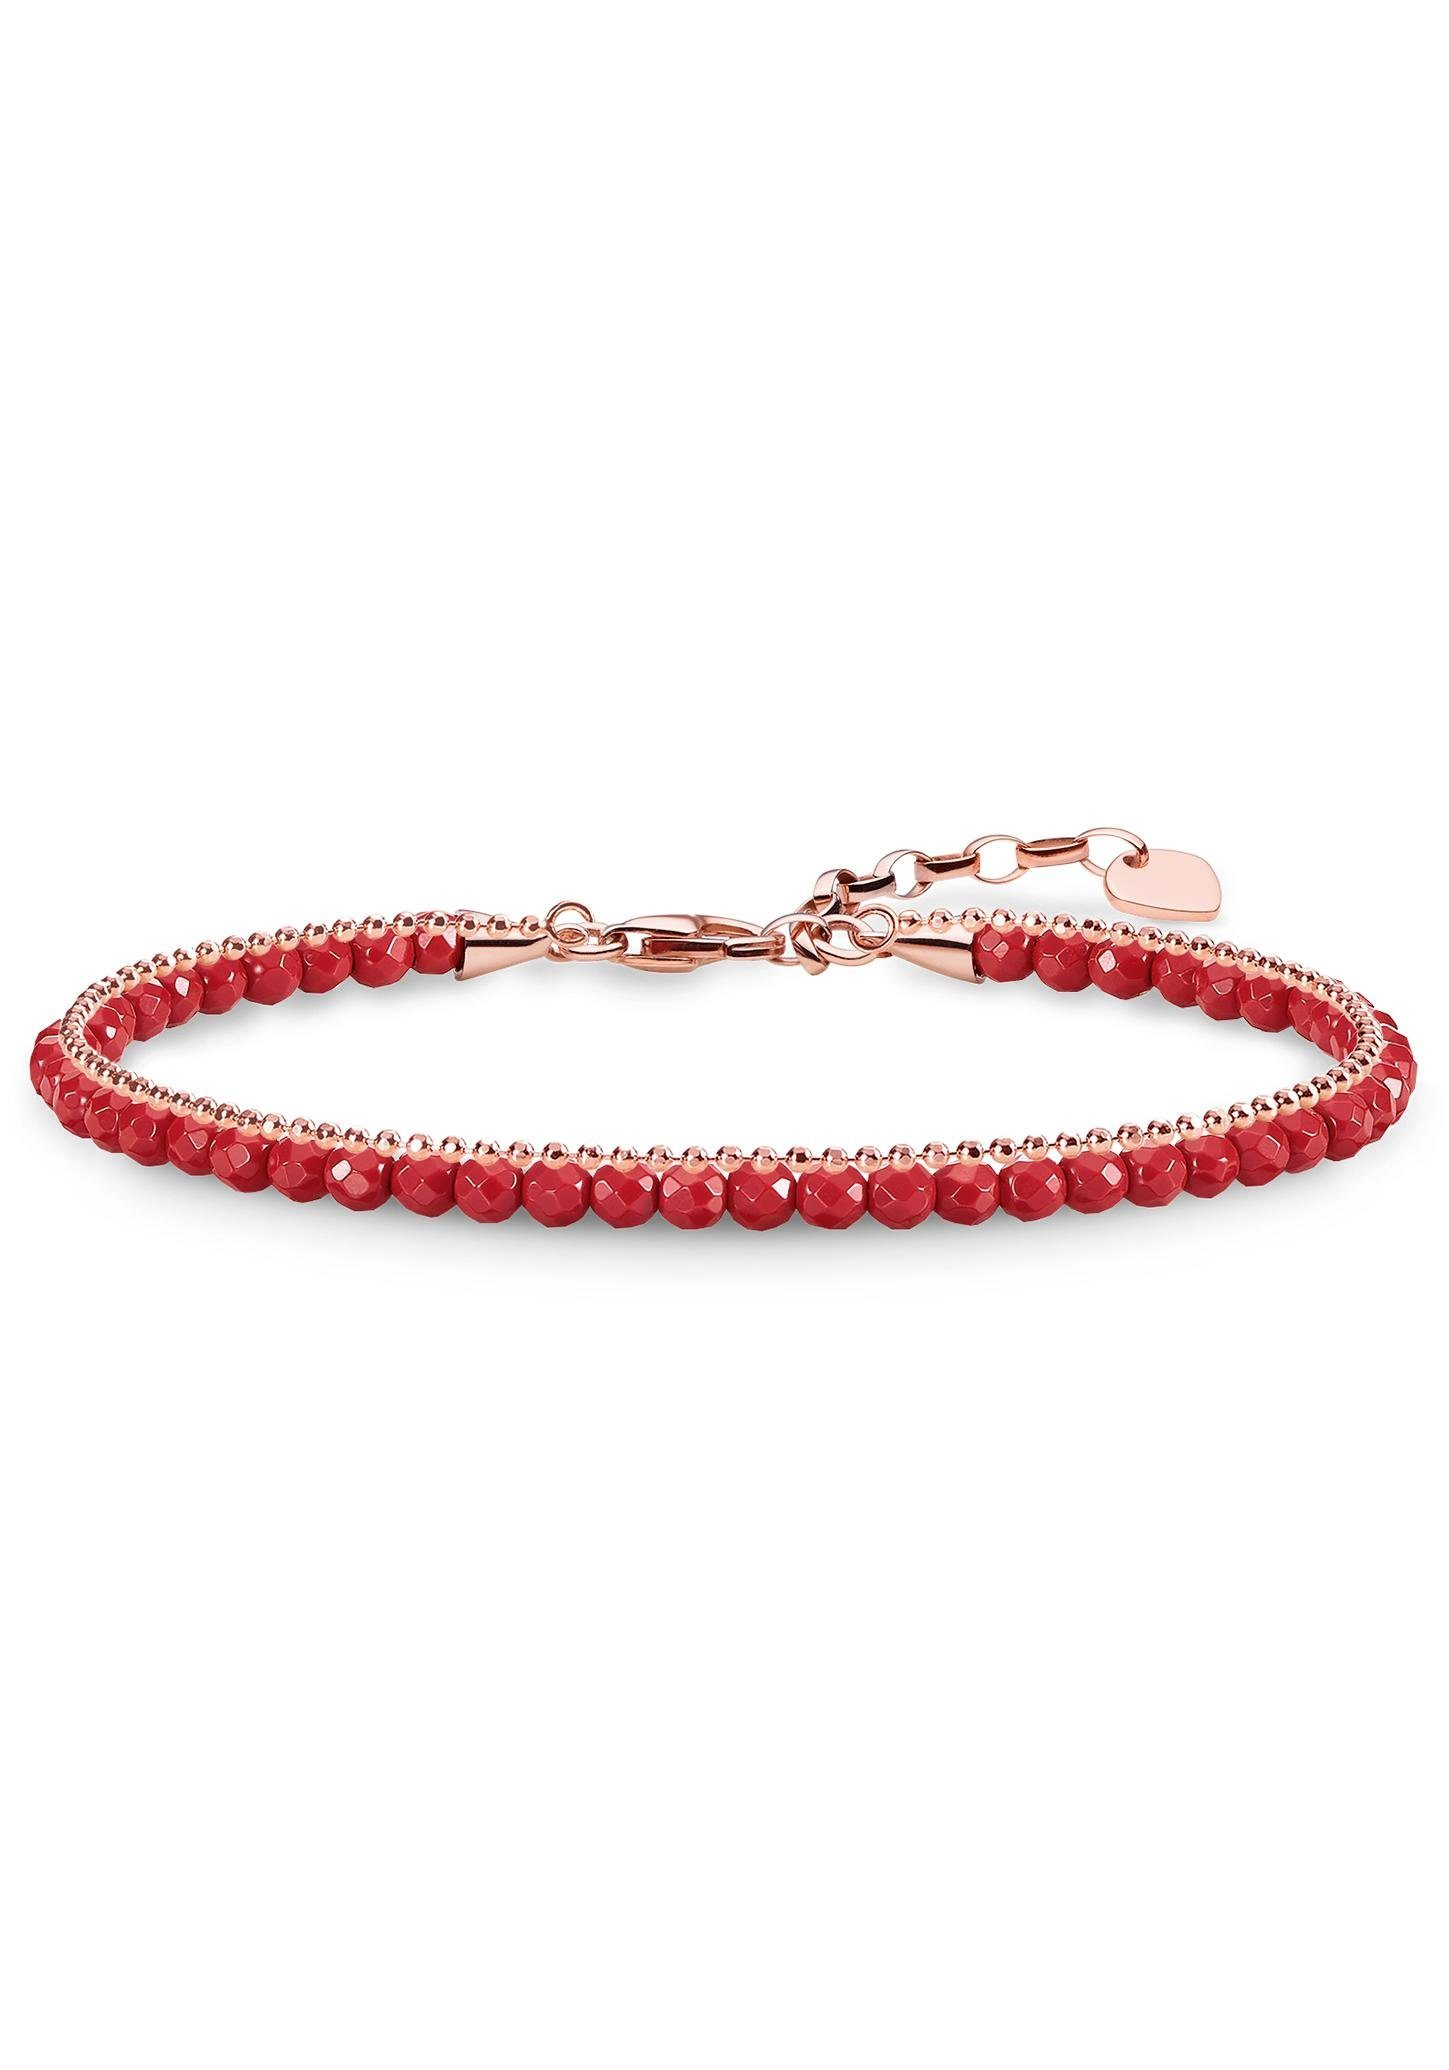 THOMAS SABO Armband »Rot, A1717-109-10-L19v« mit imit. Korallen